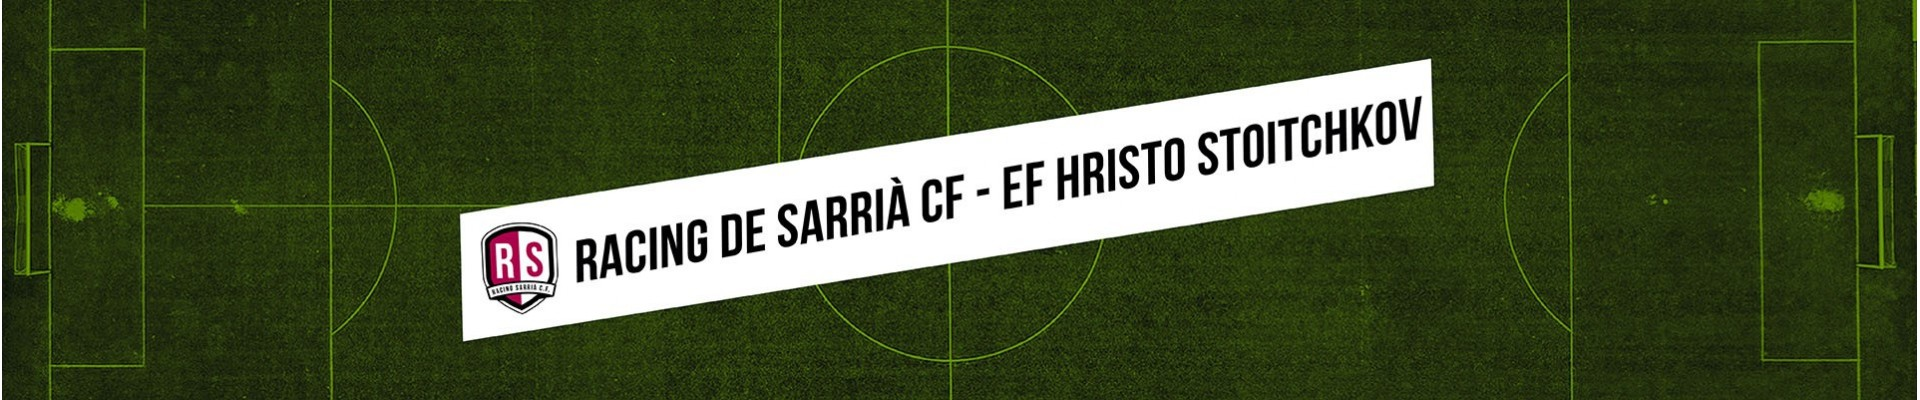 RACING DE SARRIA CF